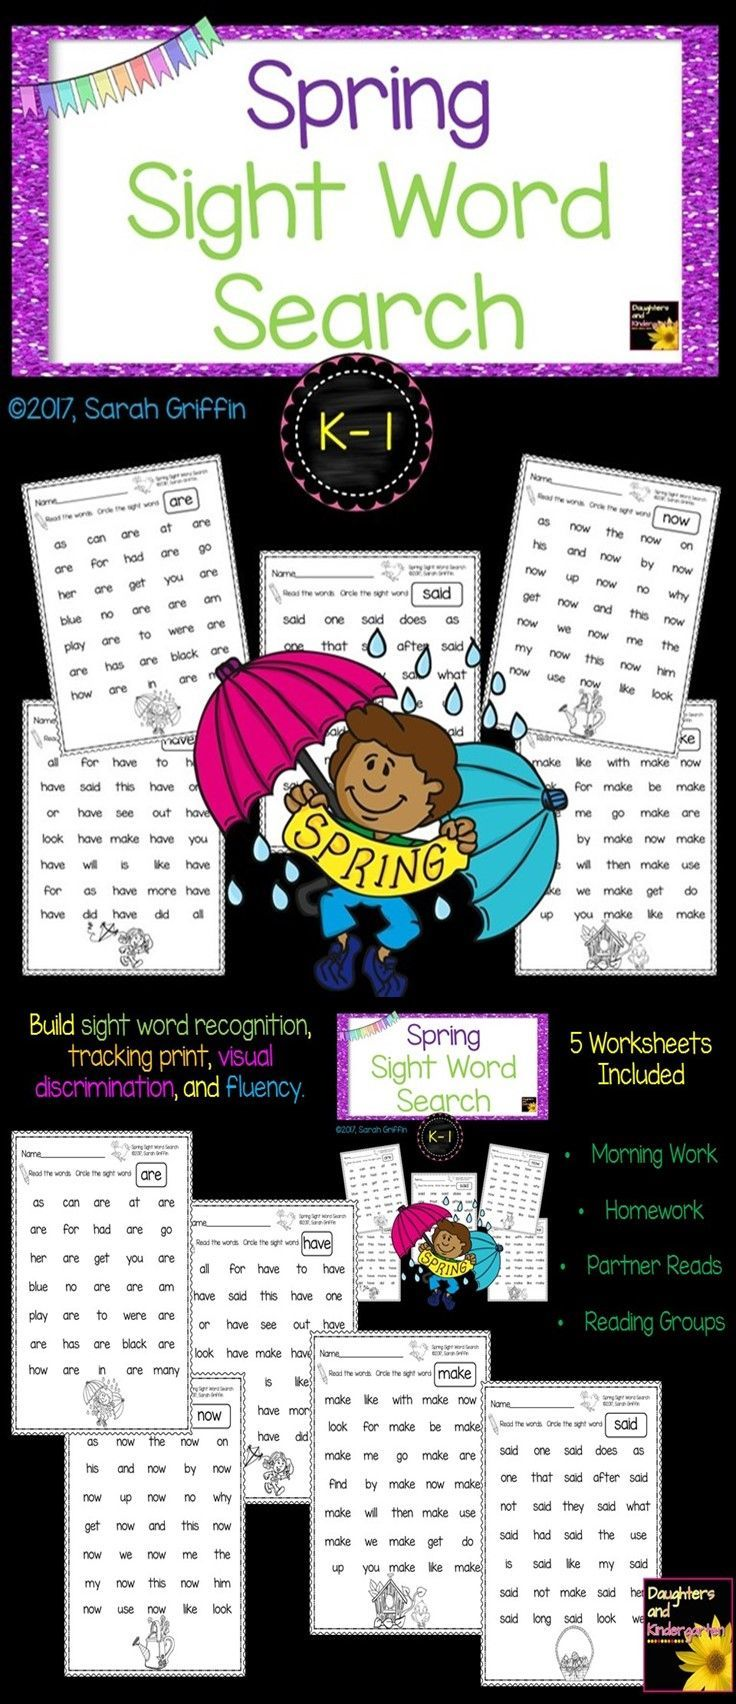 Spring sight word search worksheets morning work homework